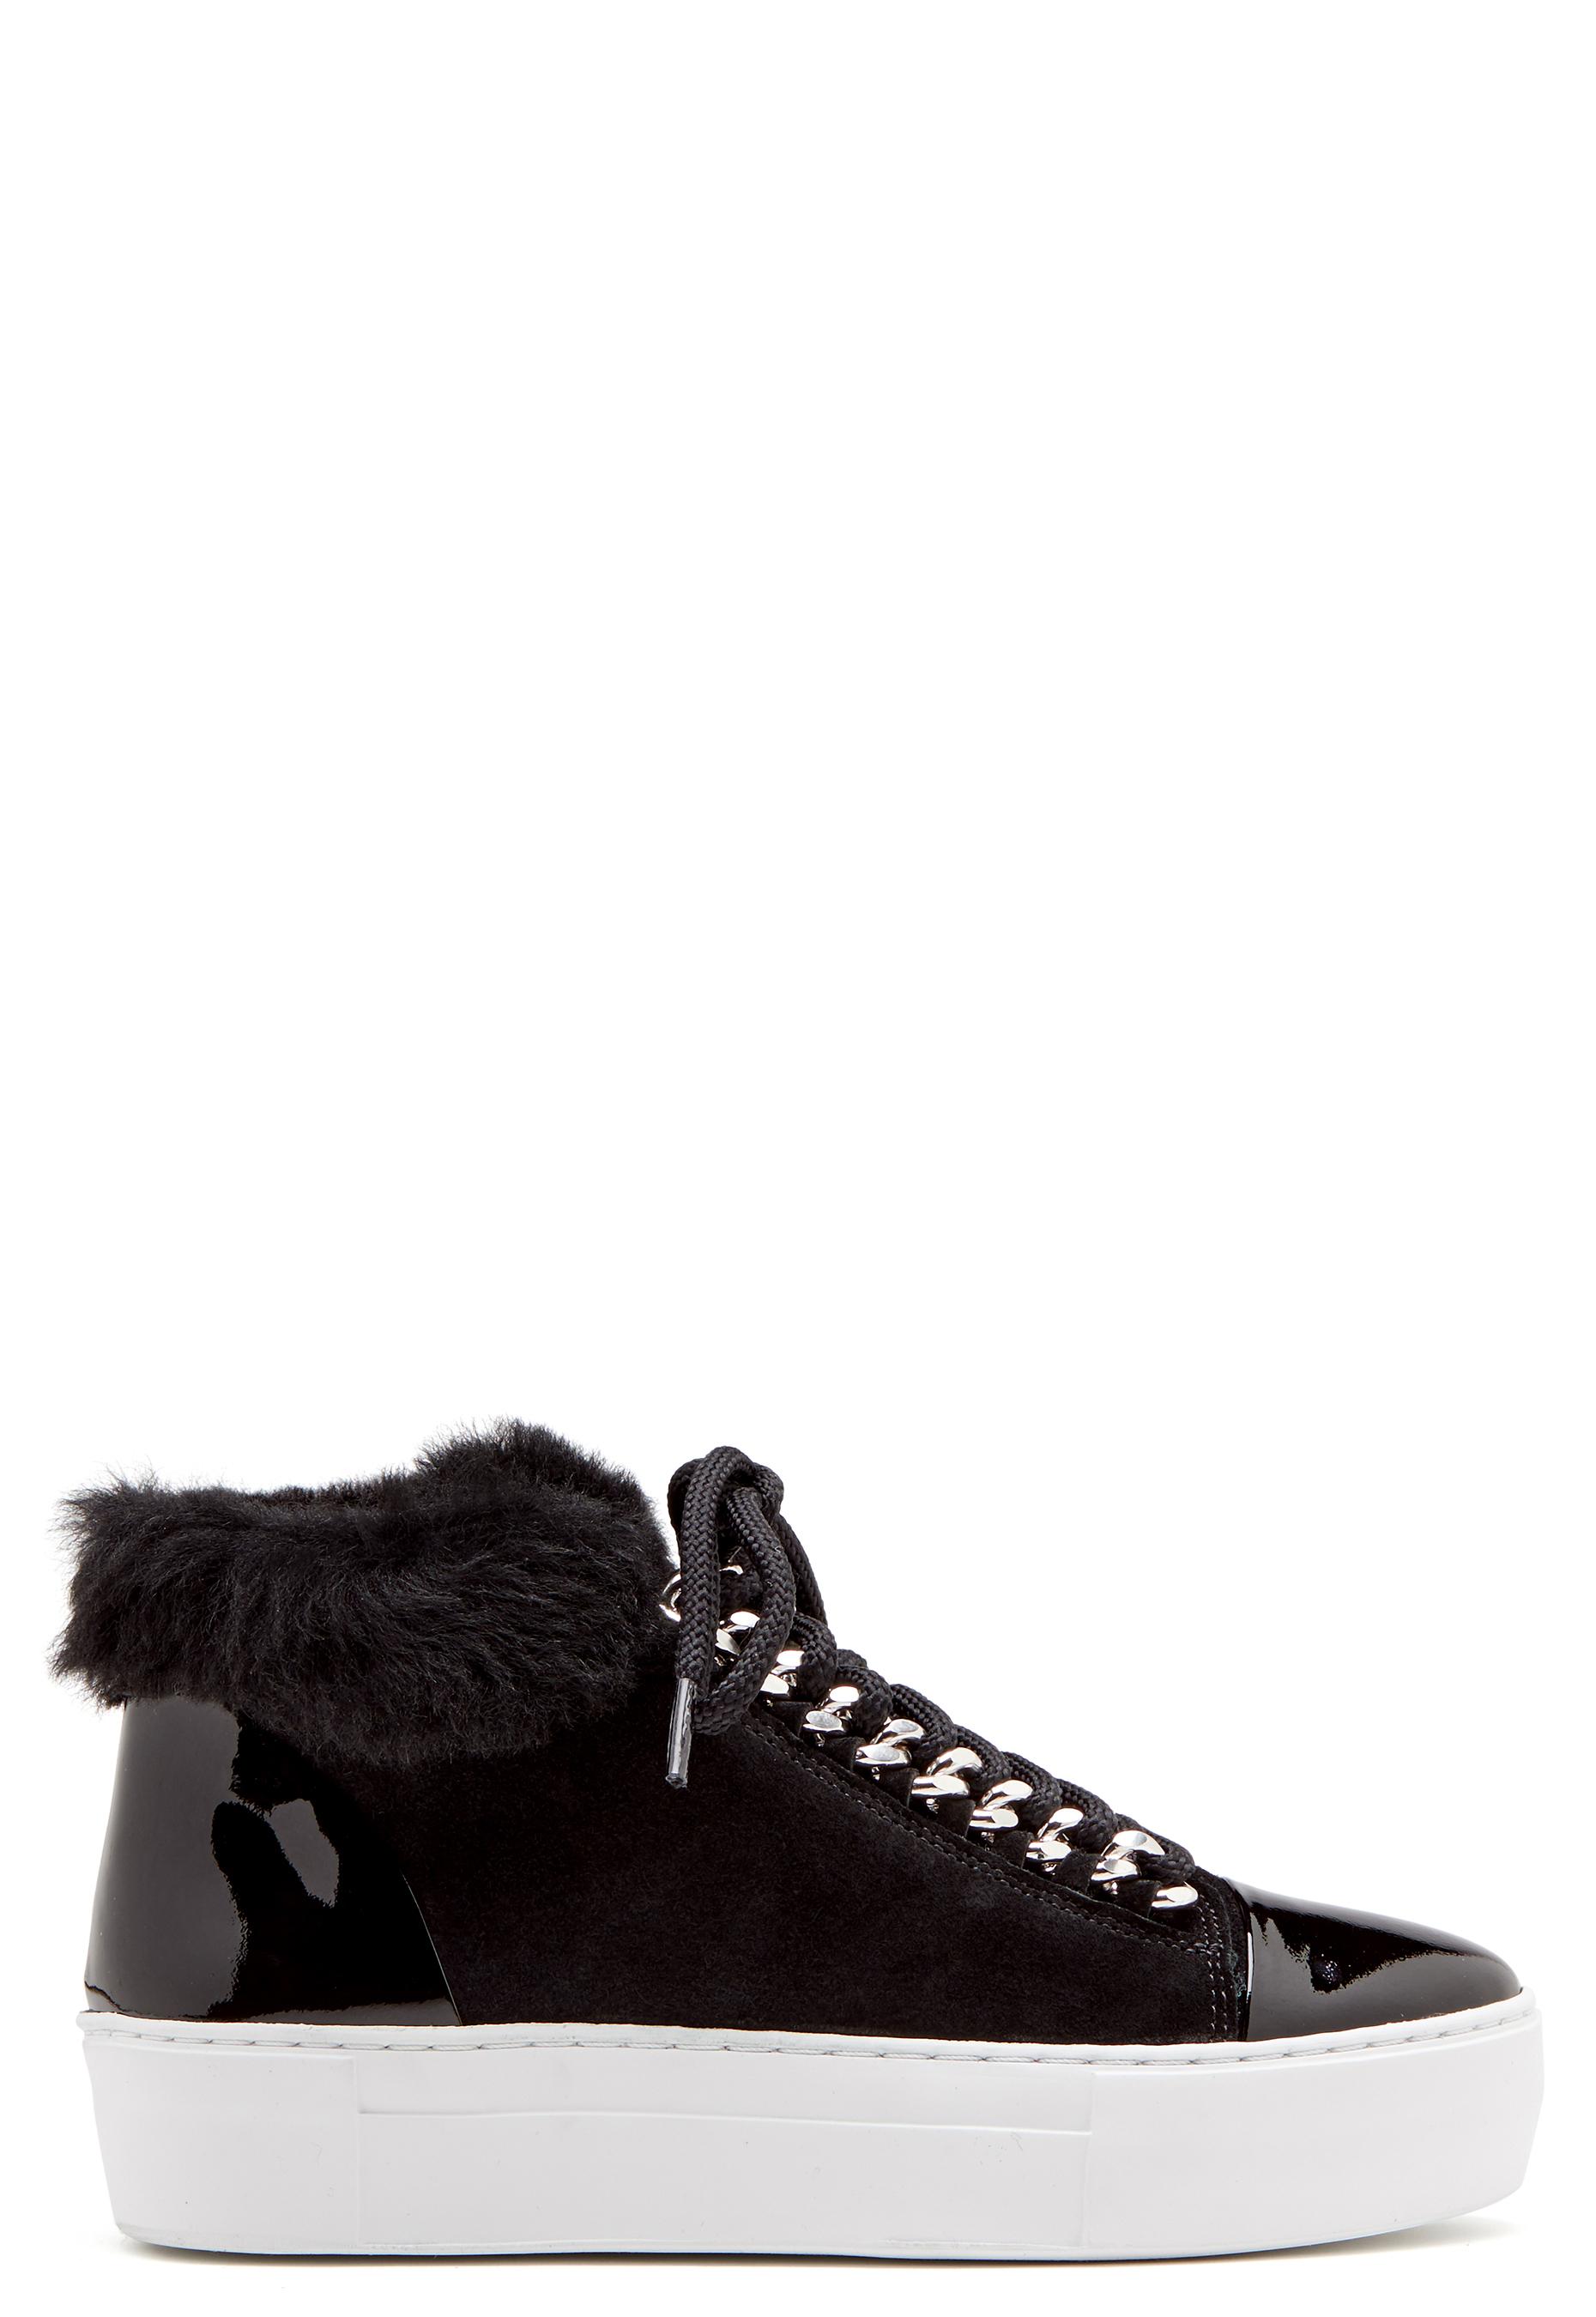 Billi Bi Suede Shoes BlackBlack Bubbleroom